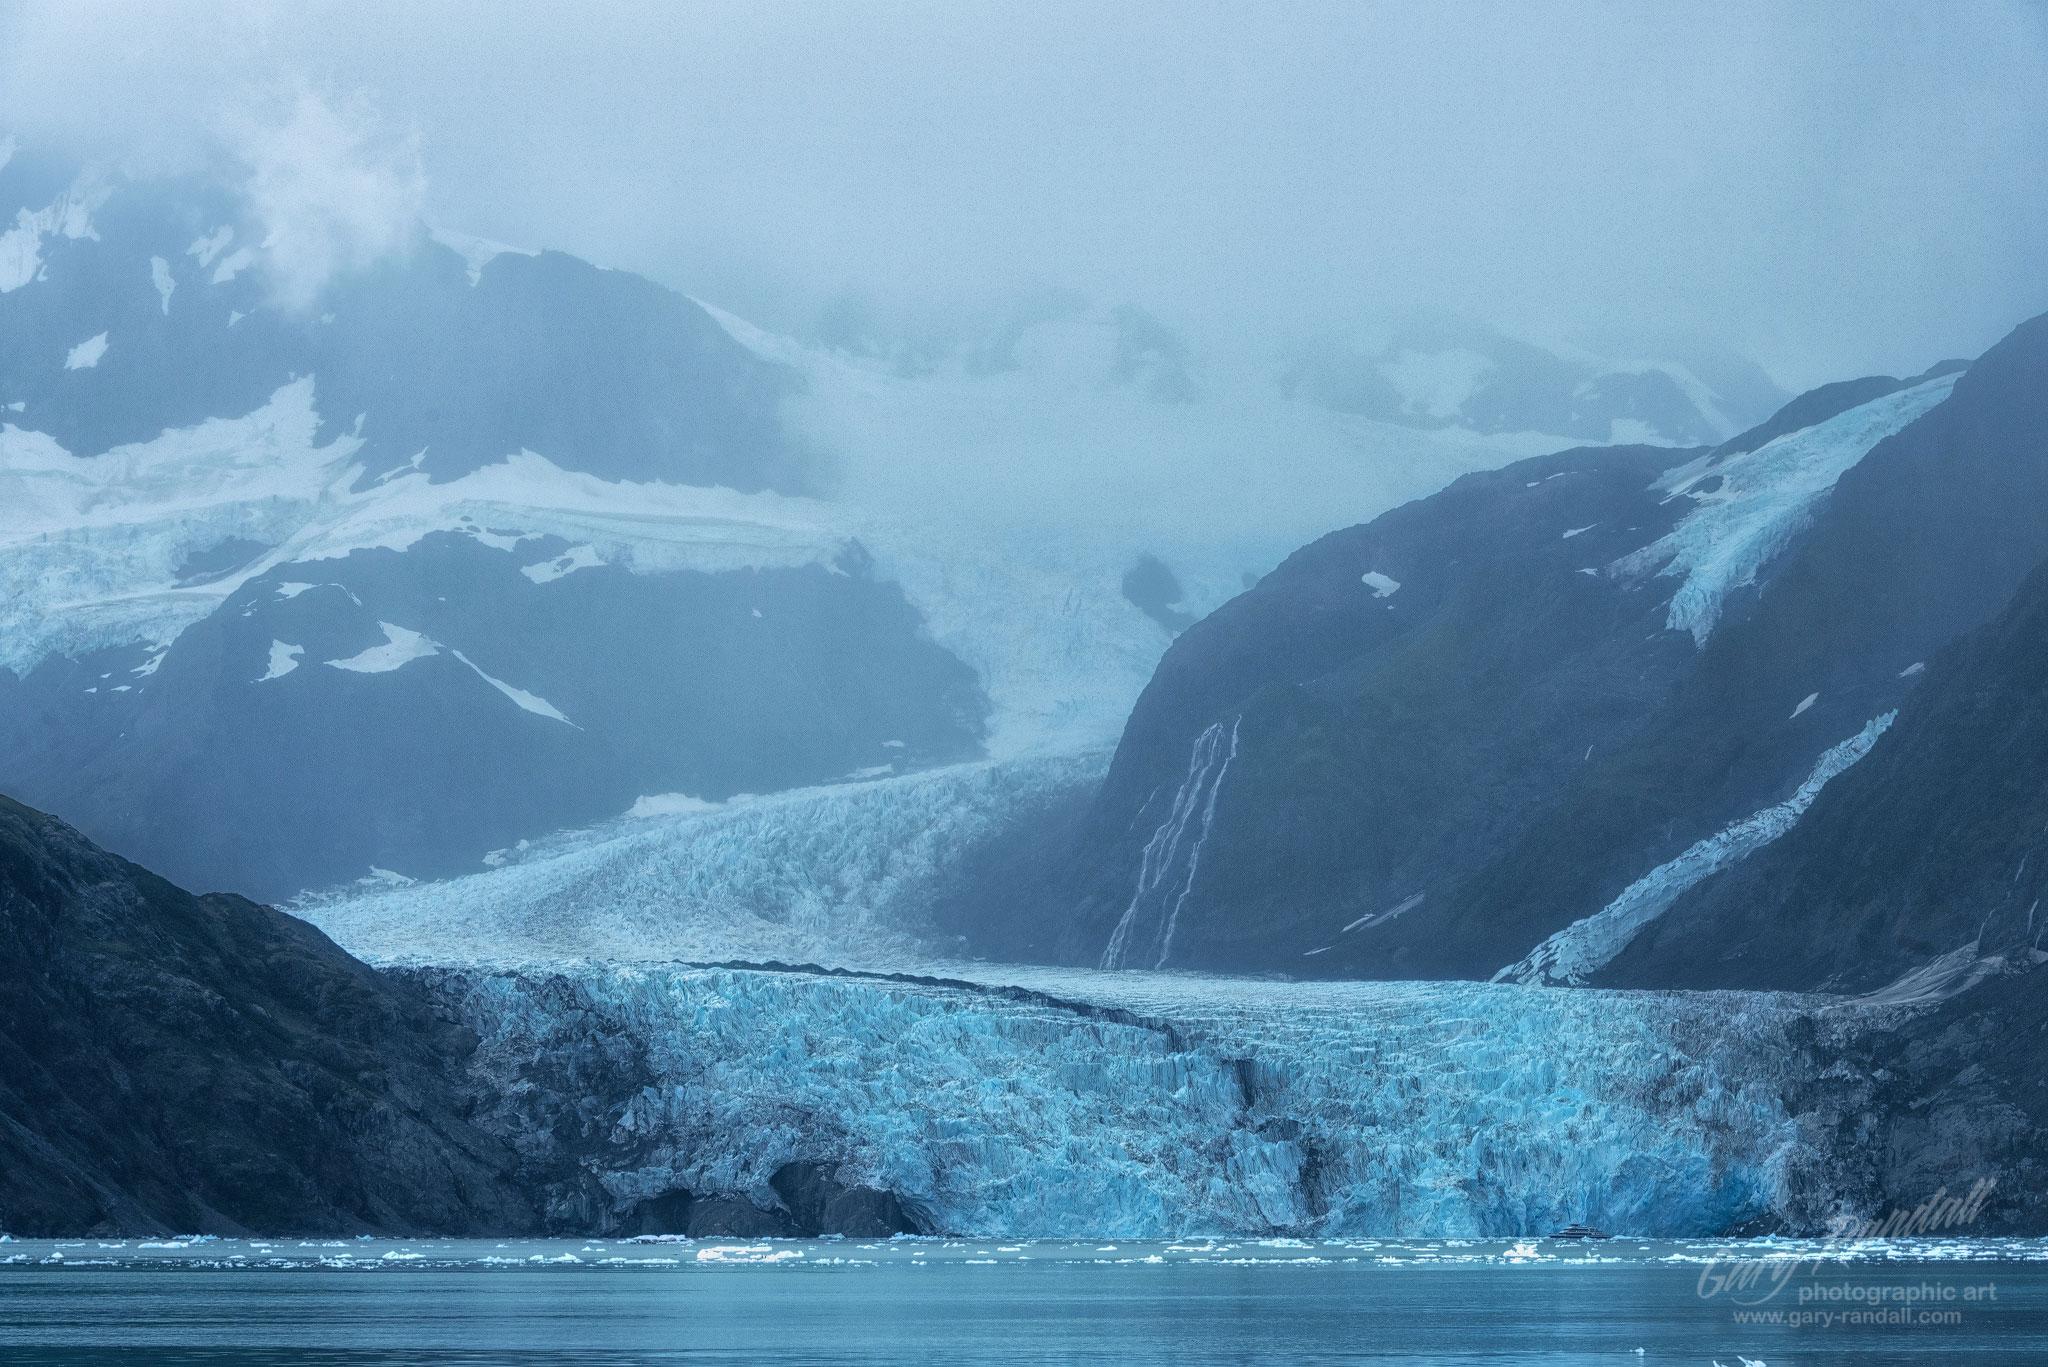 Photographing Alaska Glaciers and Fjords - Gary Randall